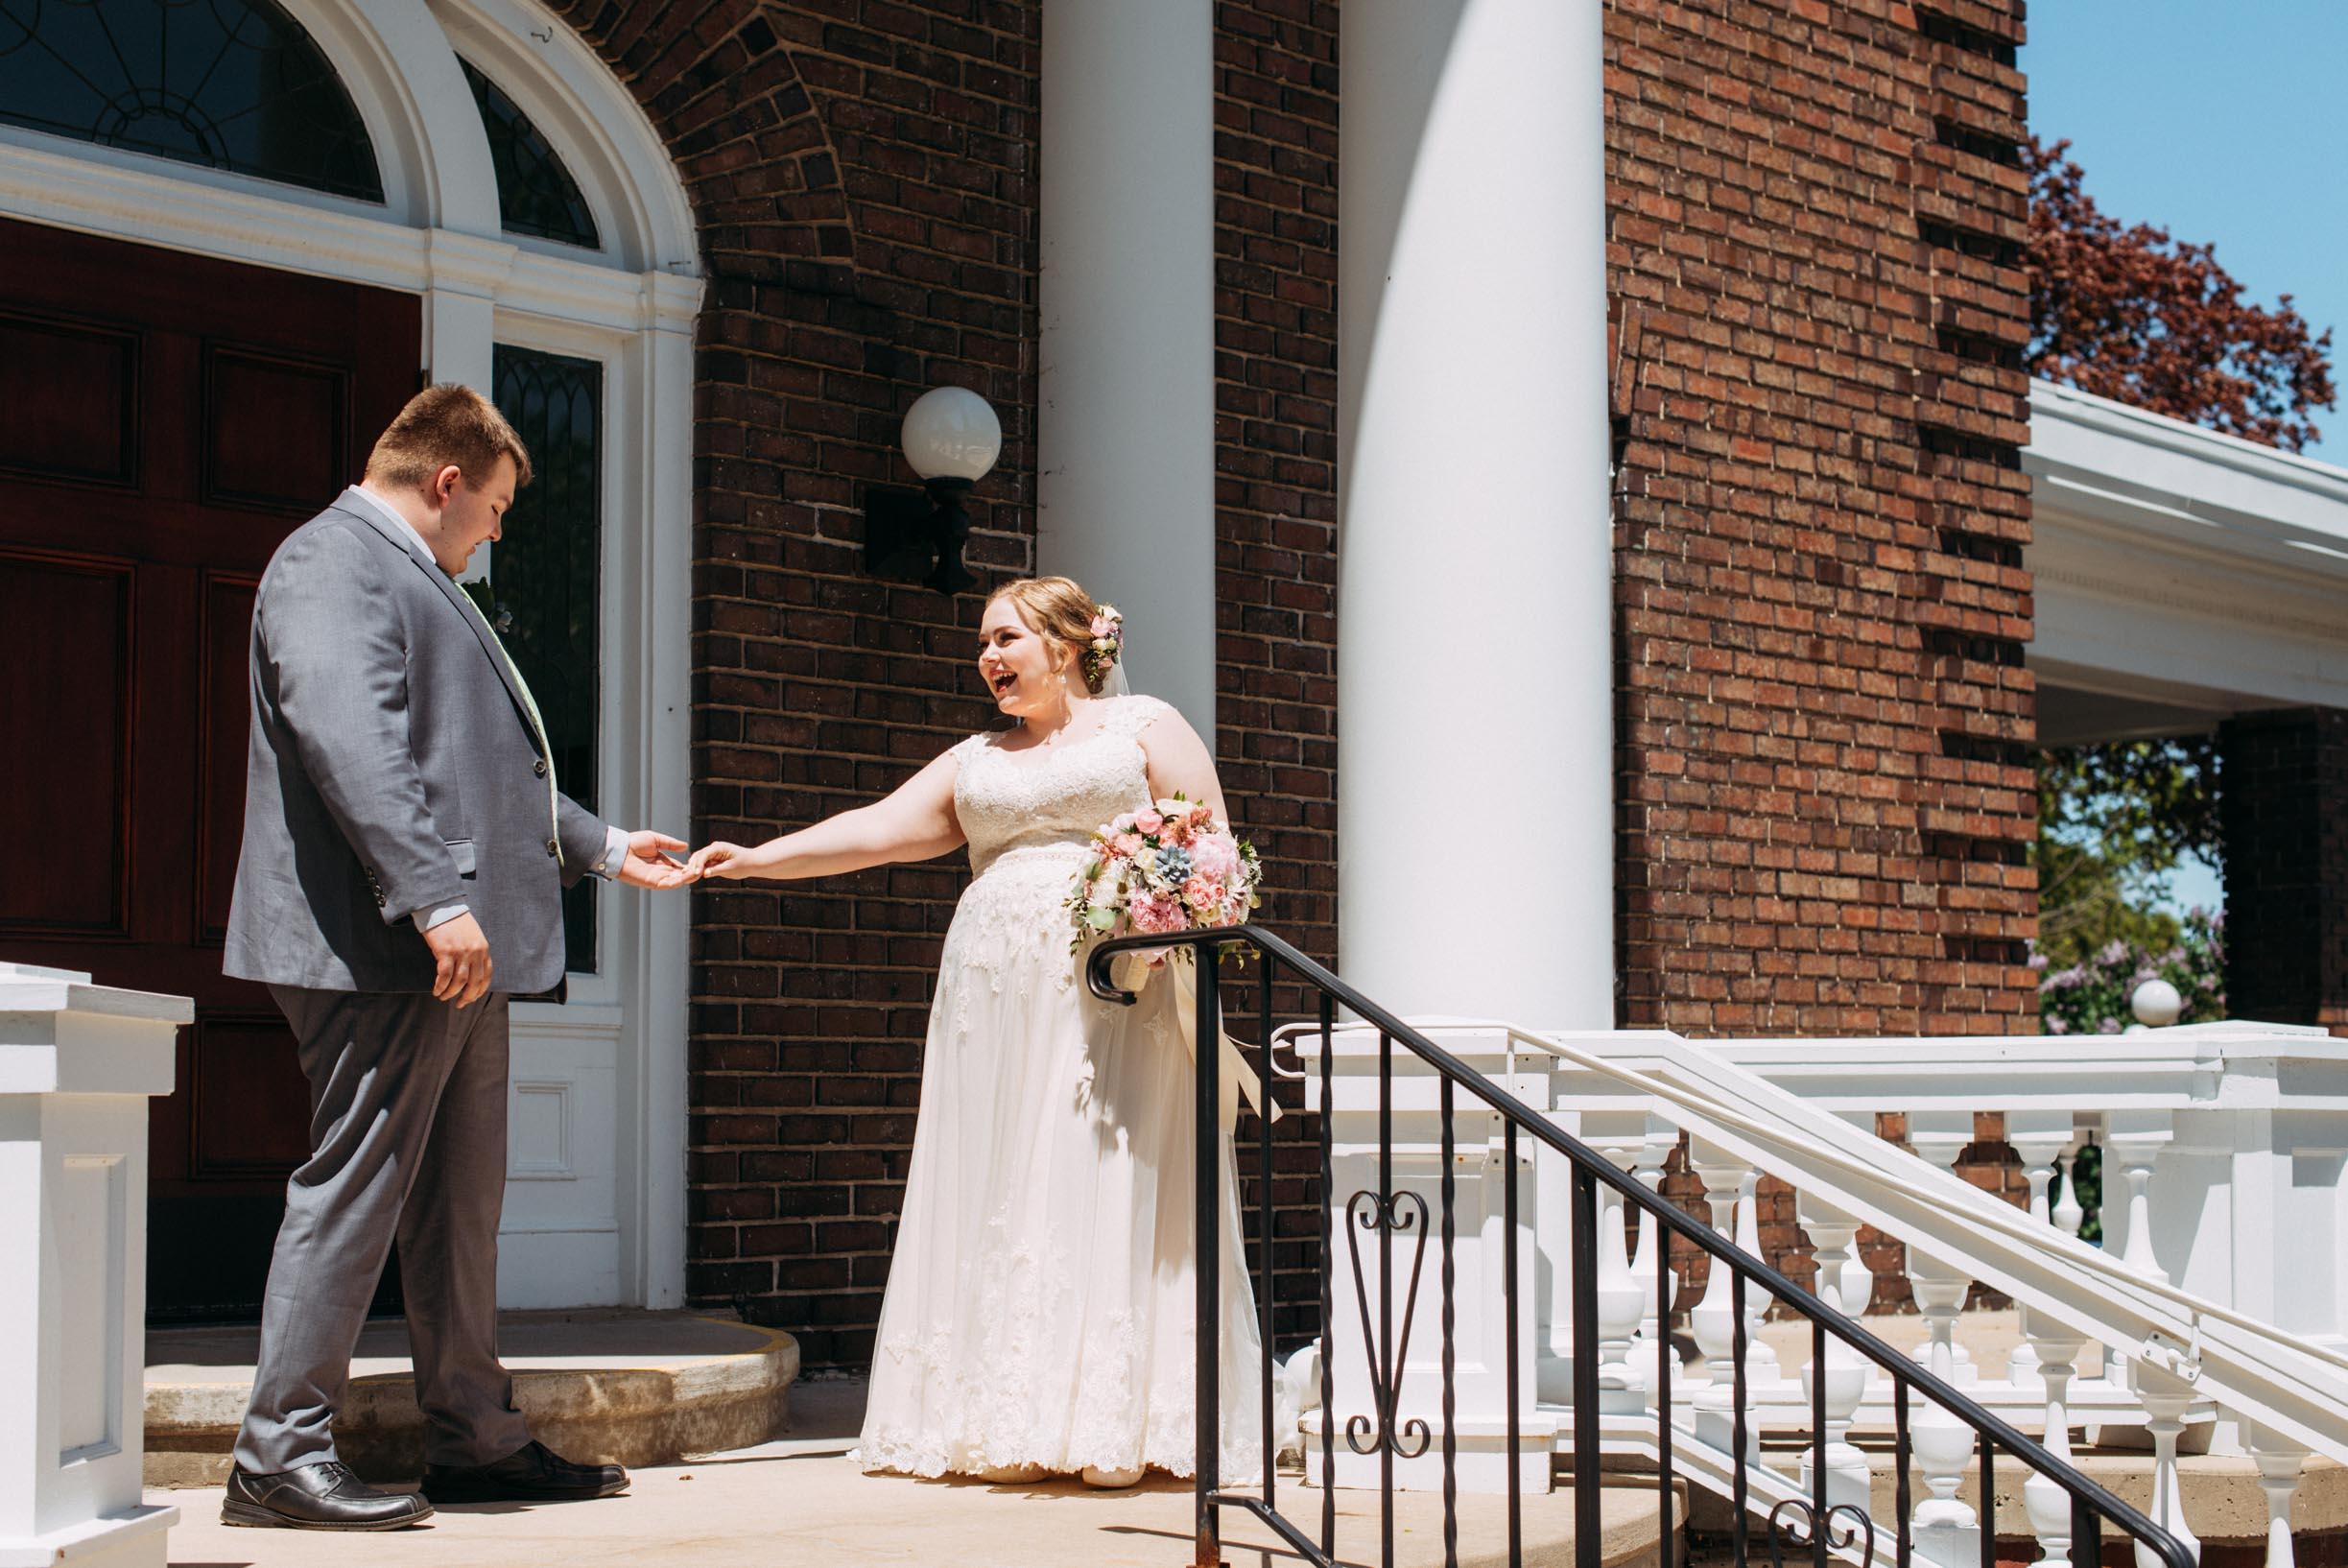 Hannah_Brandon_Wisconsin_Wedding_First_Look-12.jpg